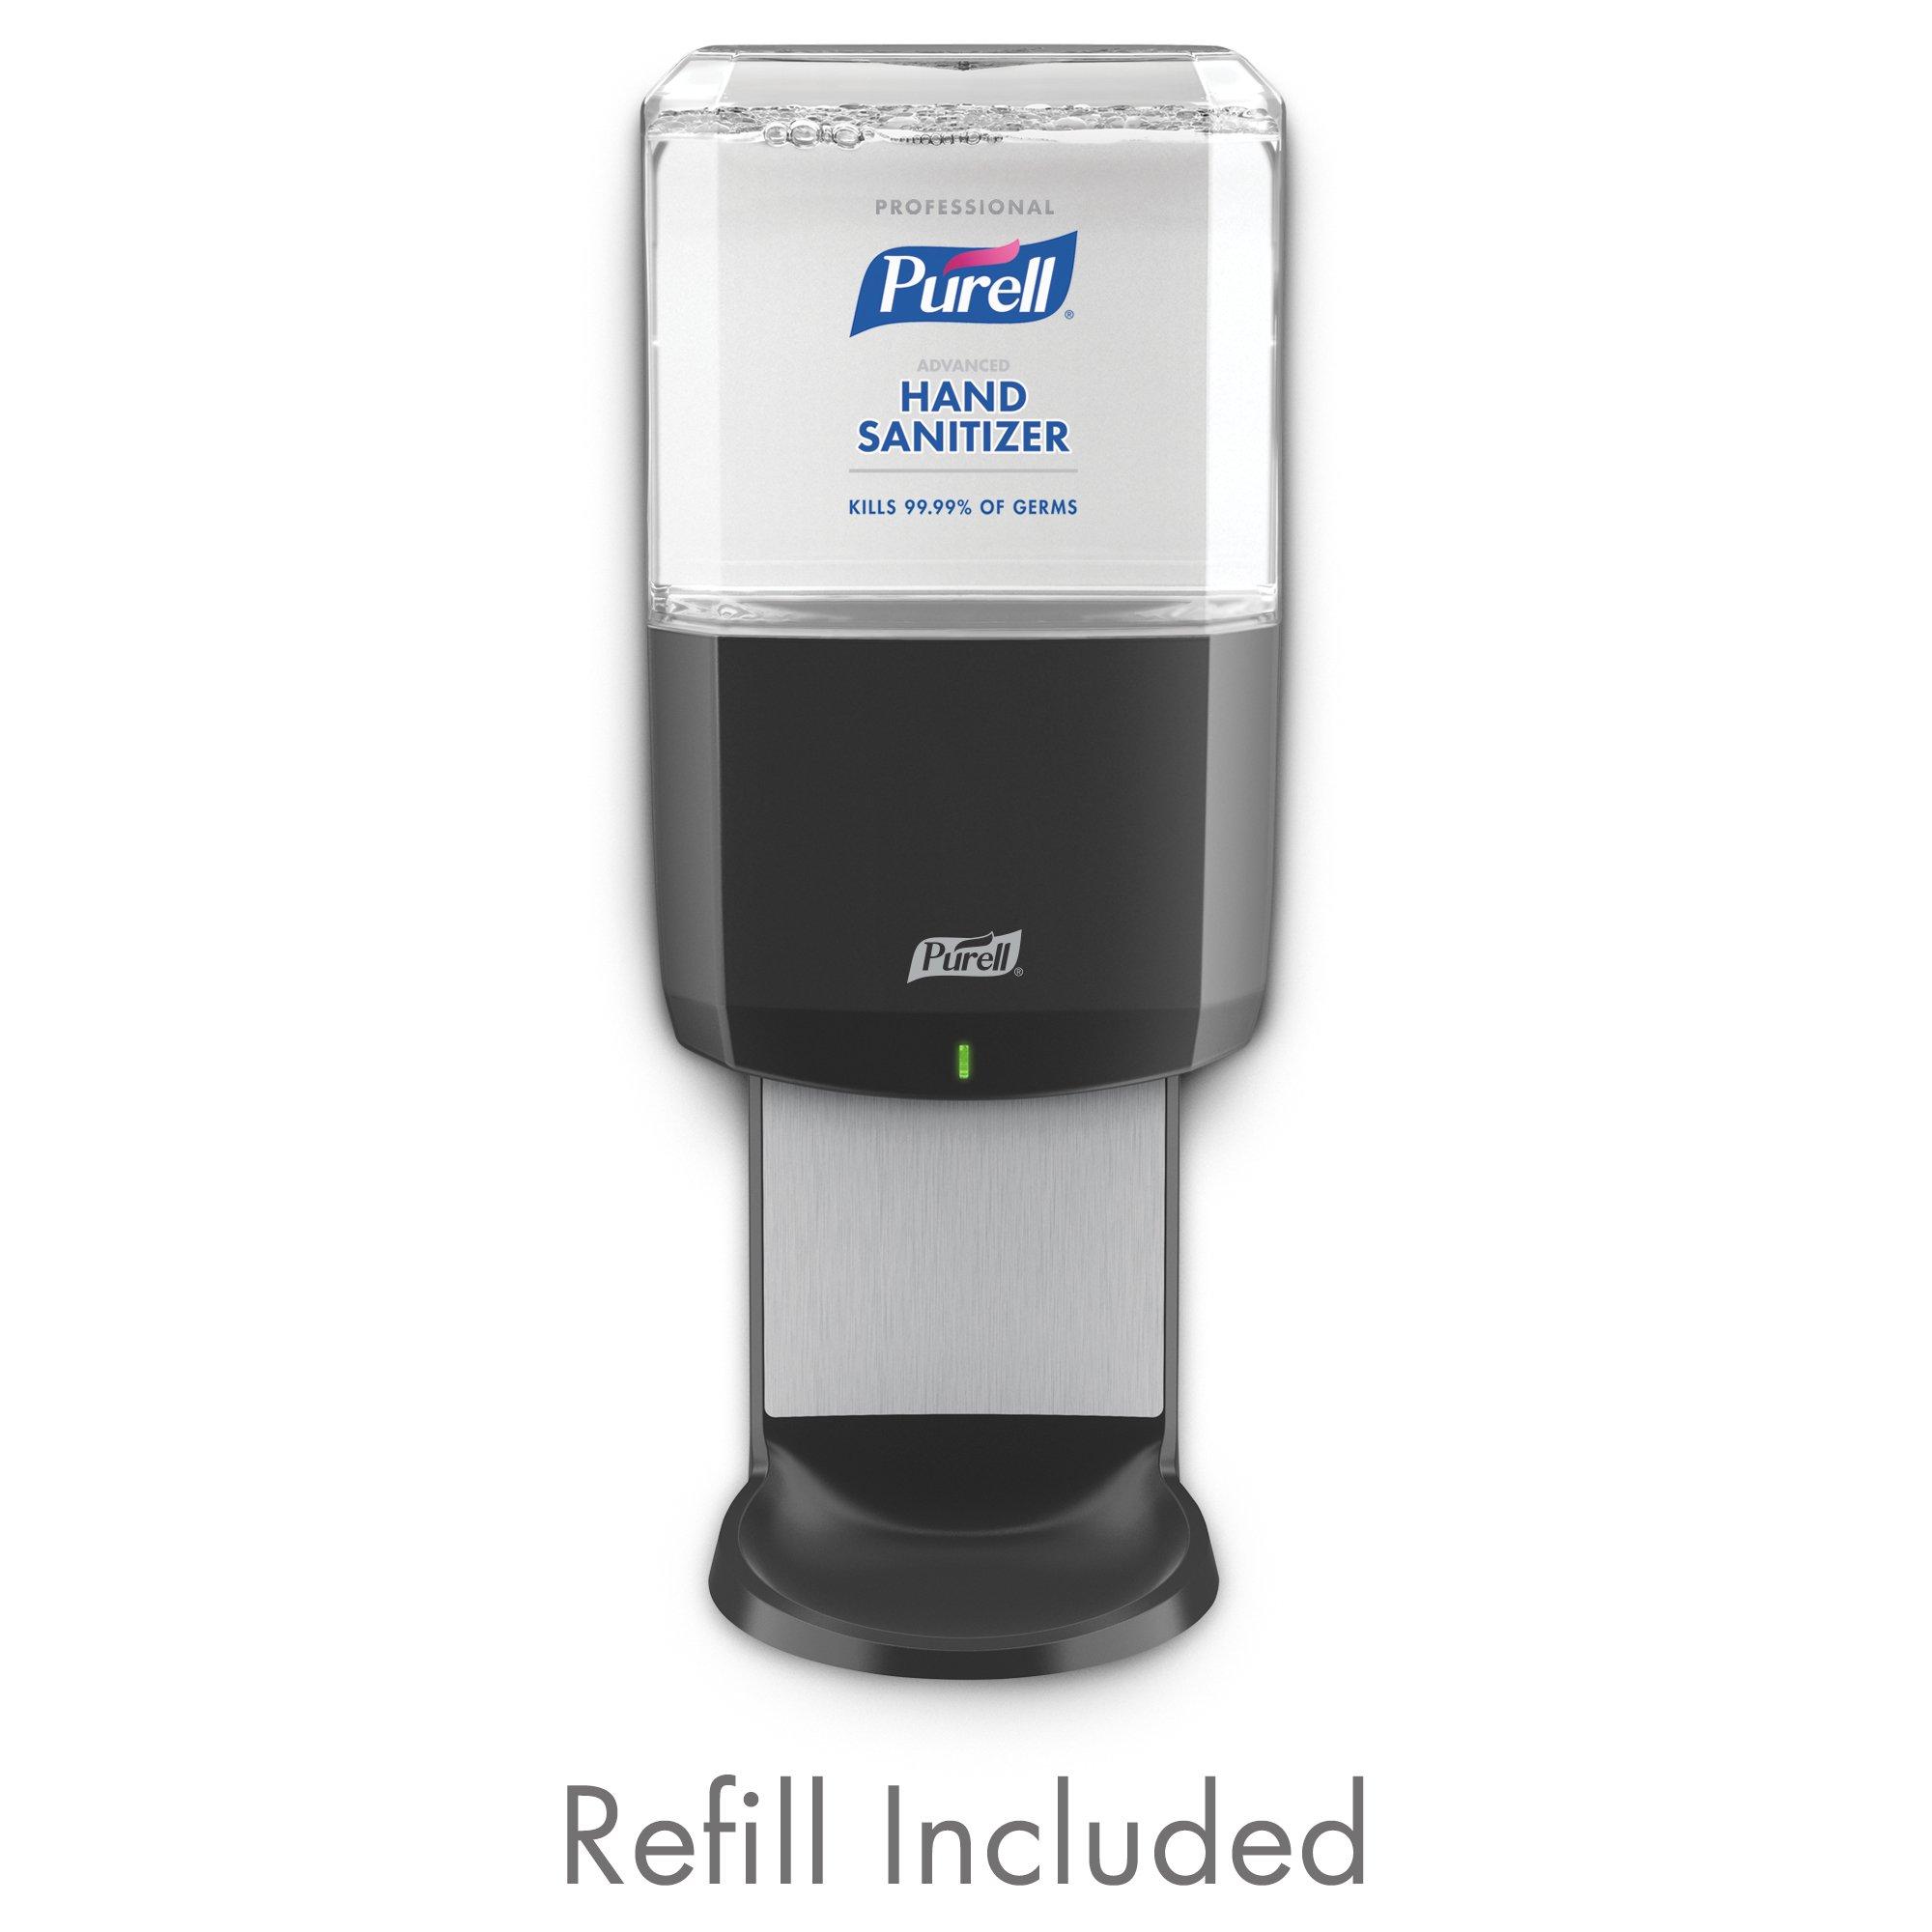 PURELL Professional Advanced Hand Sanitizer Kit, 1 ES6 Graphite Dispenser + Hand Sanitizer Foam Refill - 6454-1G